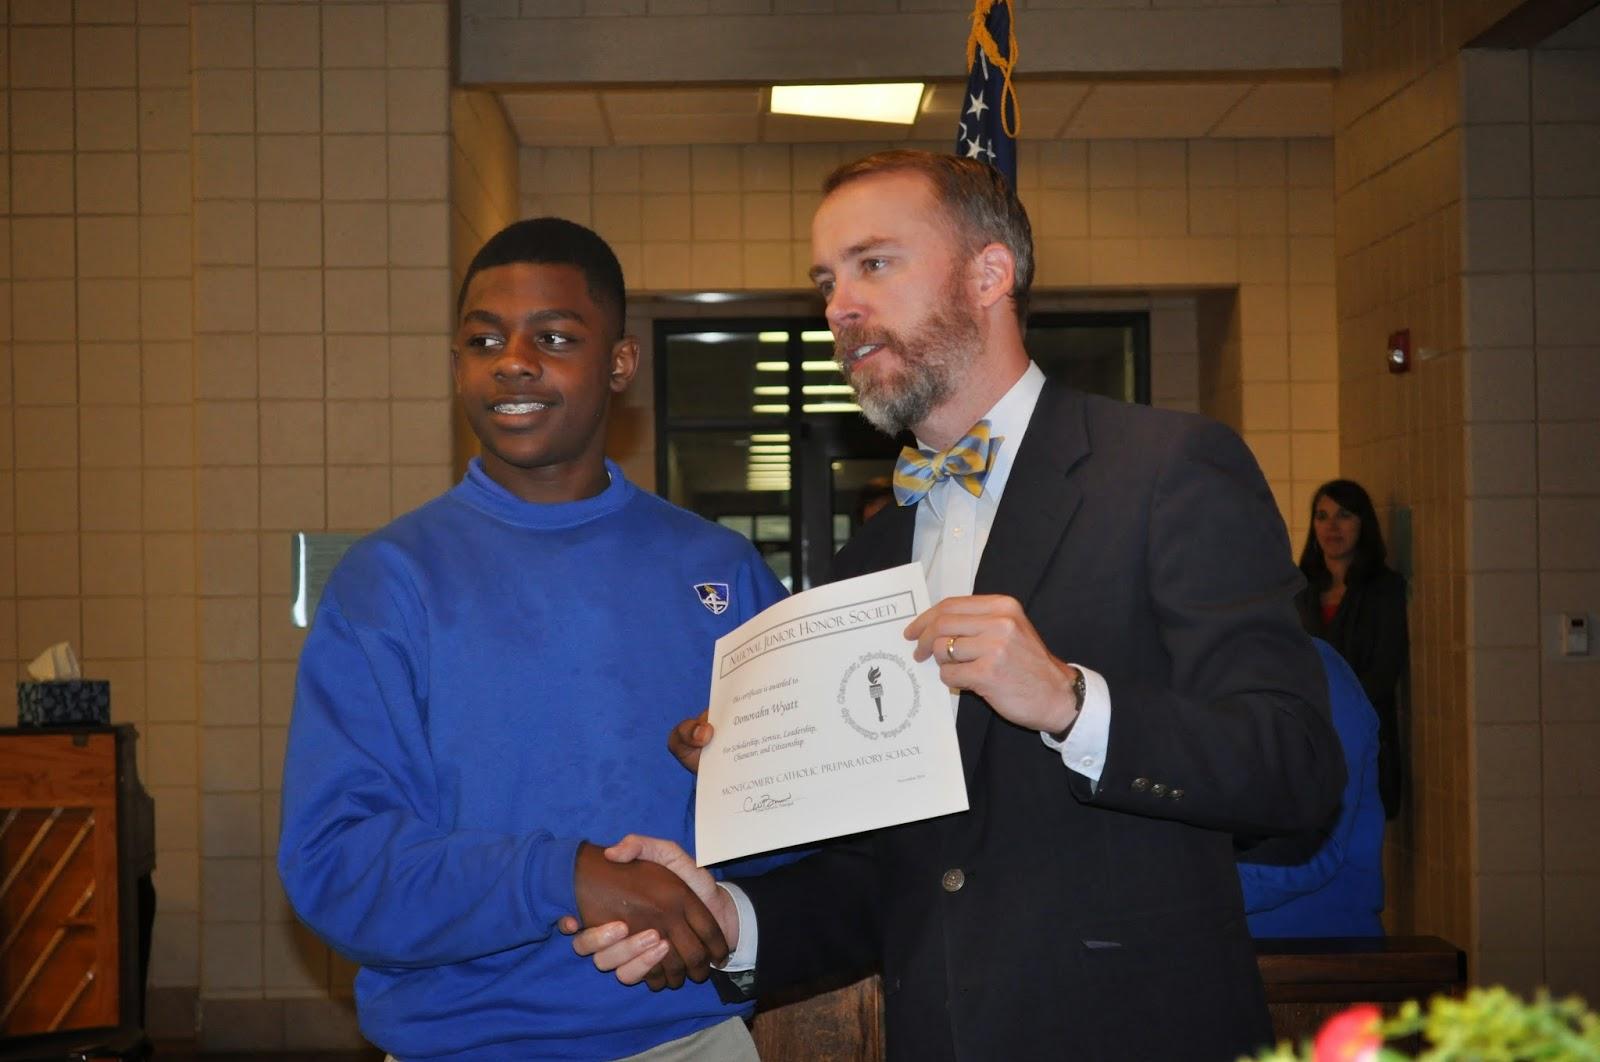 Montgomery Catholic Taps 27 New Members into National Junior Honor Society 3